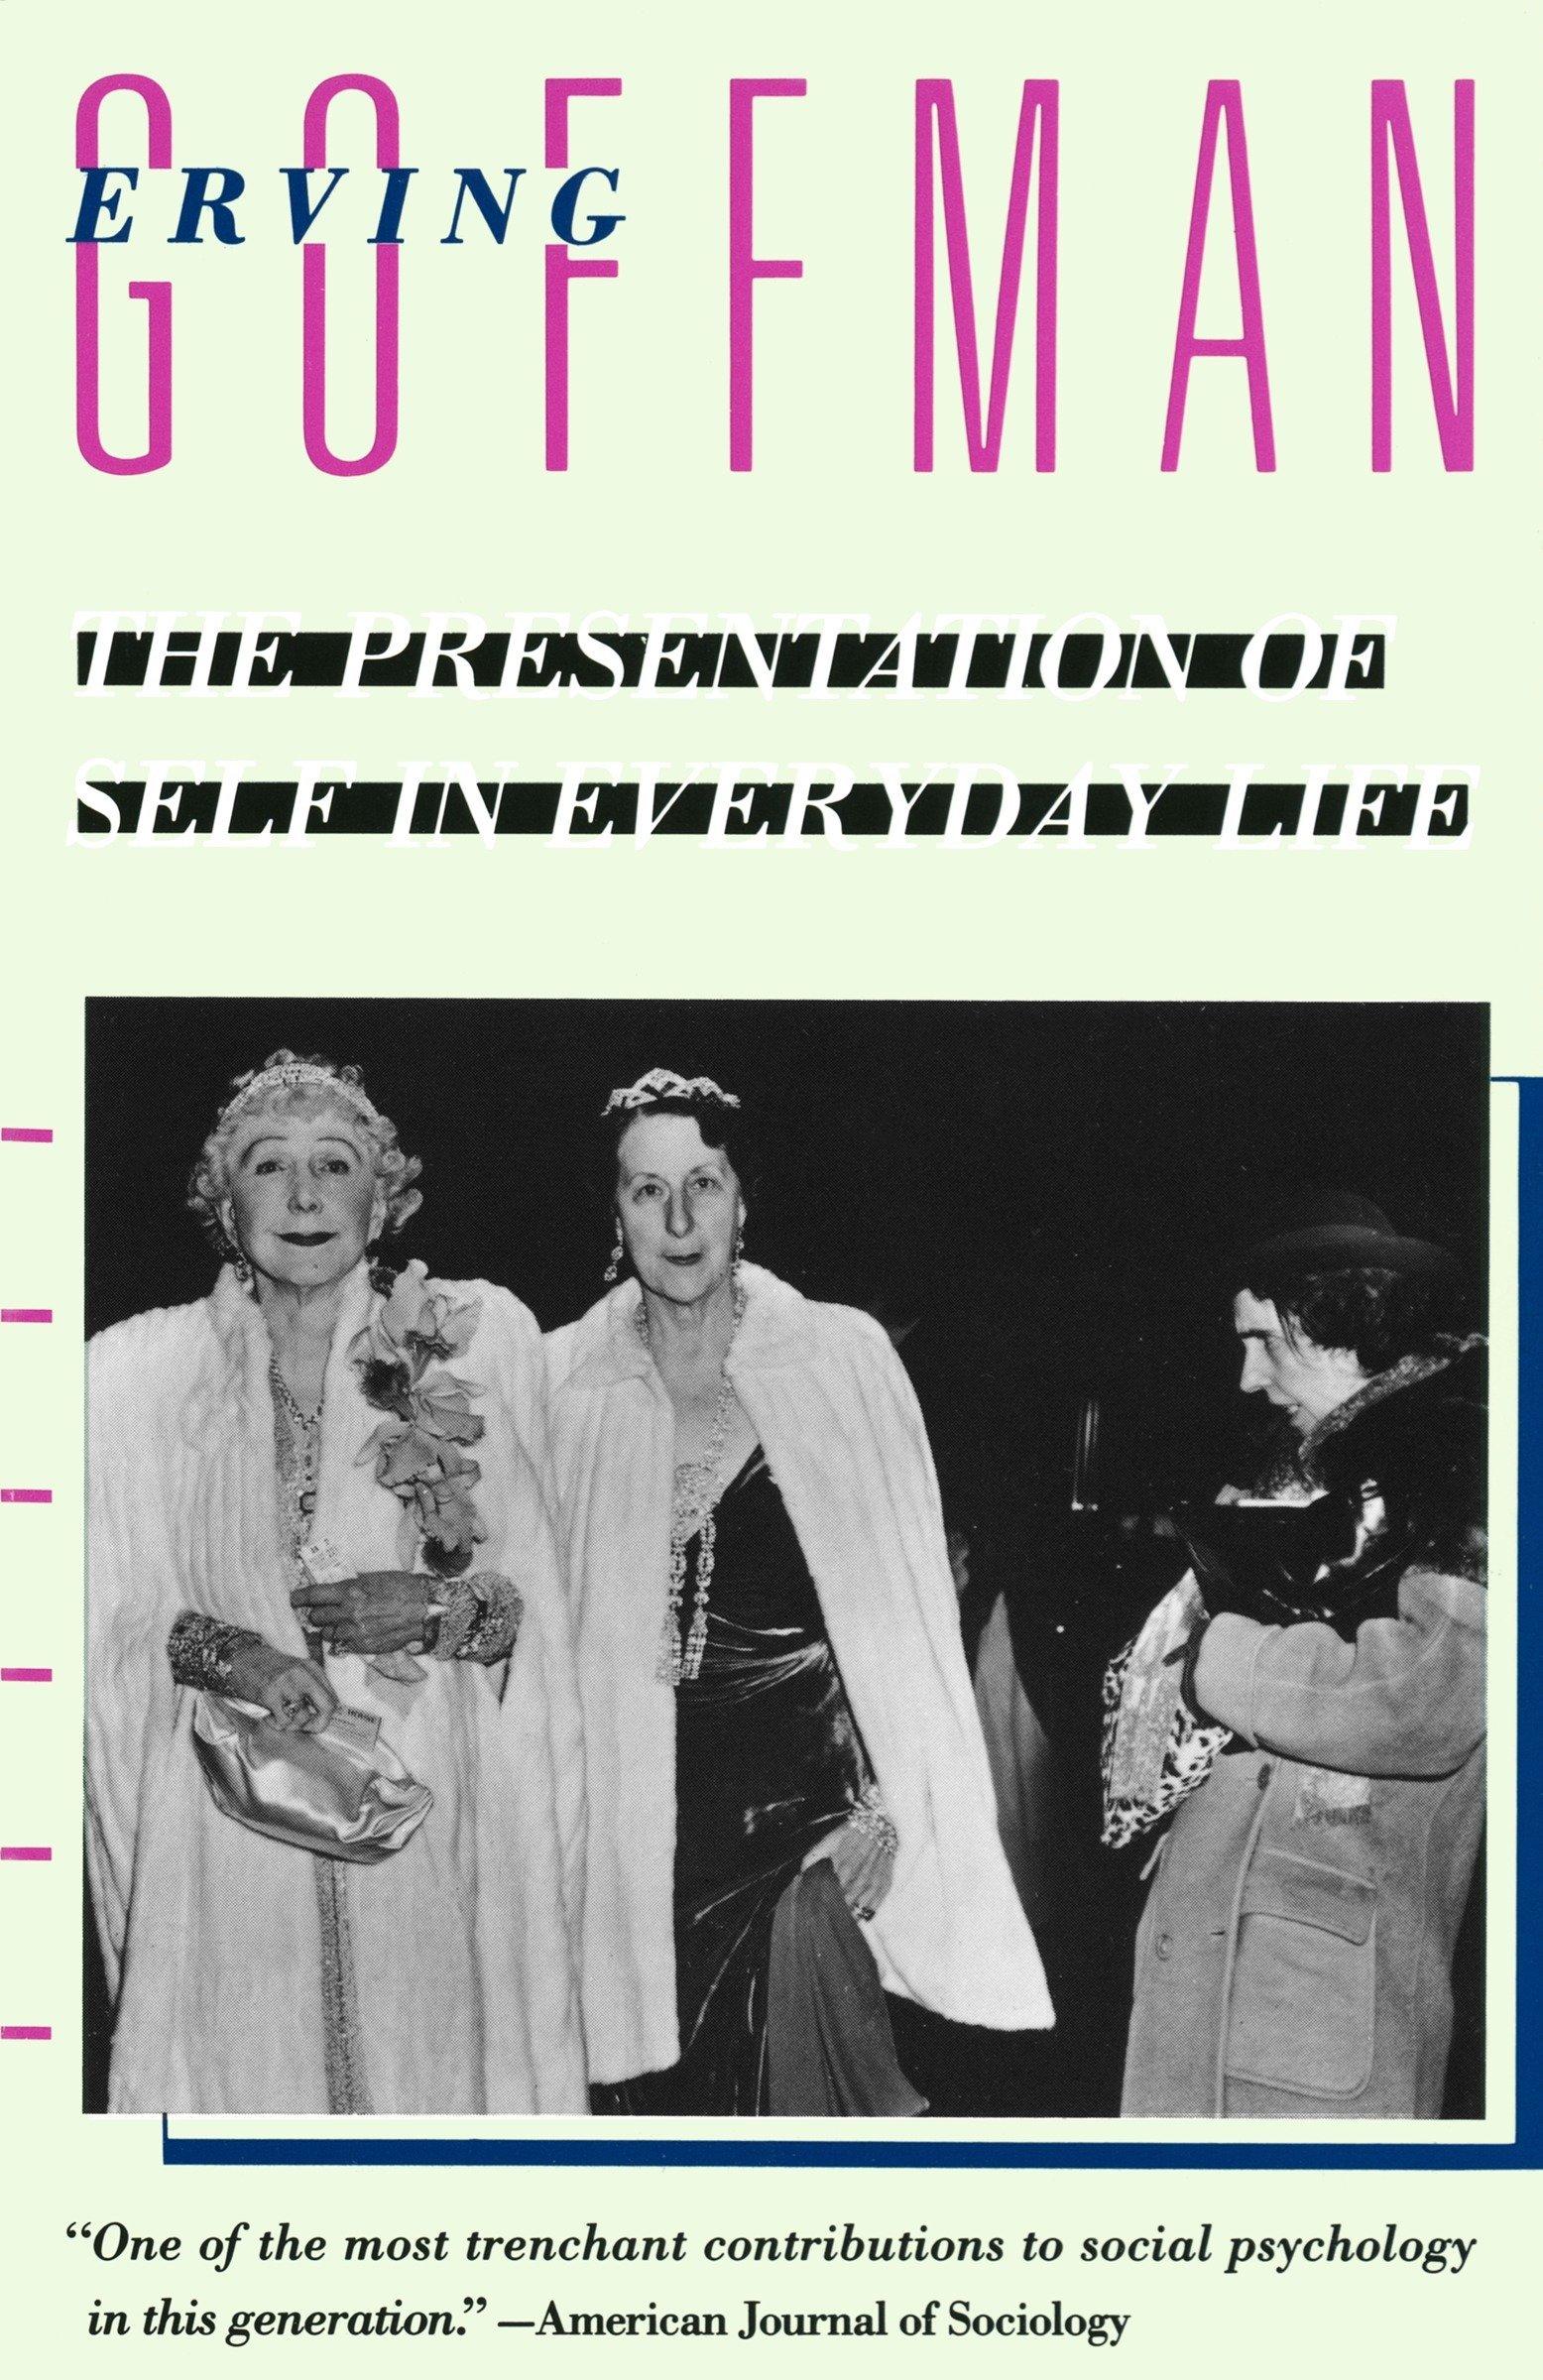 goffman 1959